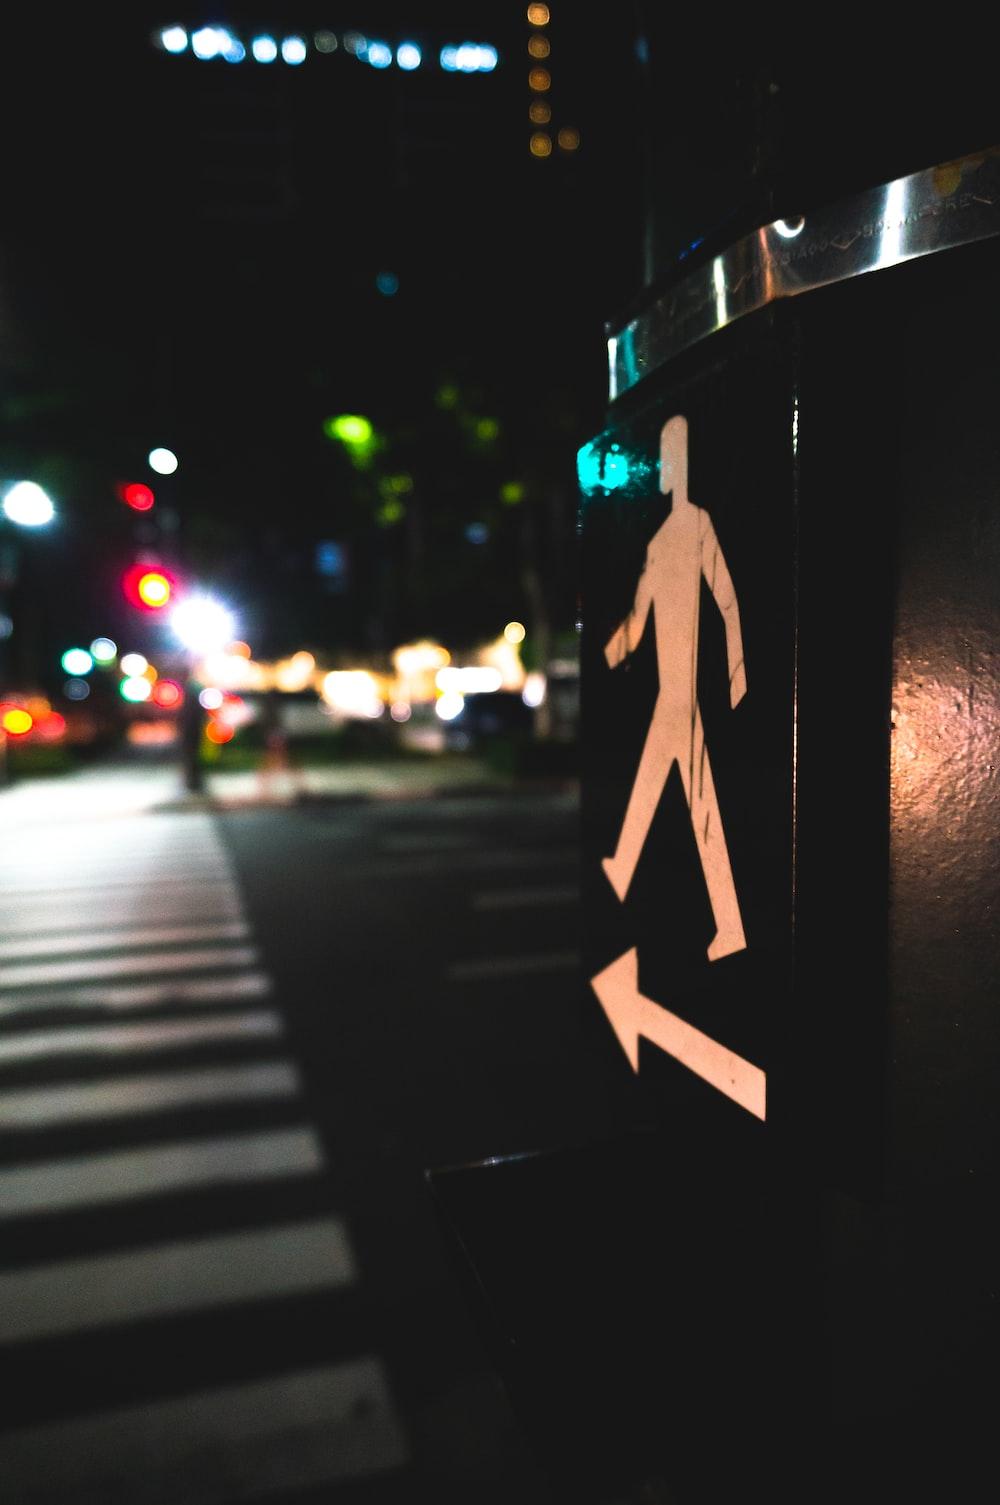 pedestrian signage